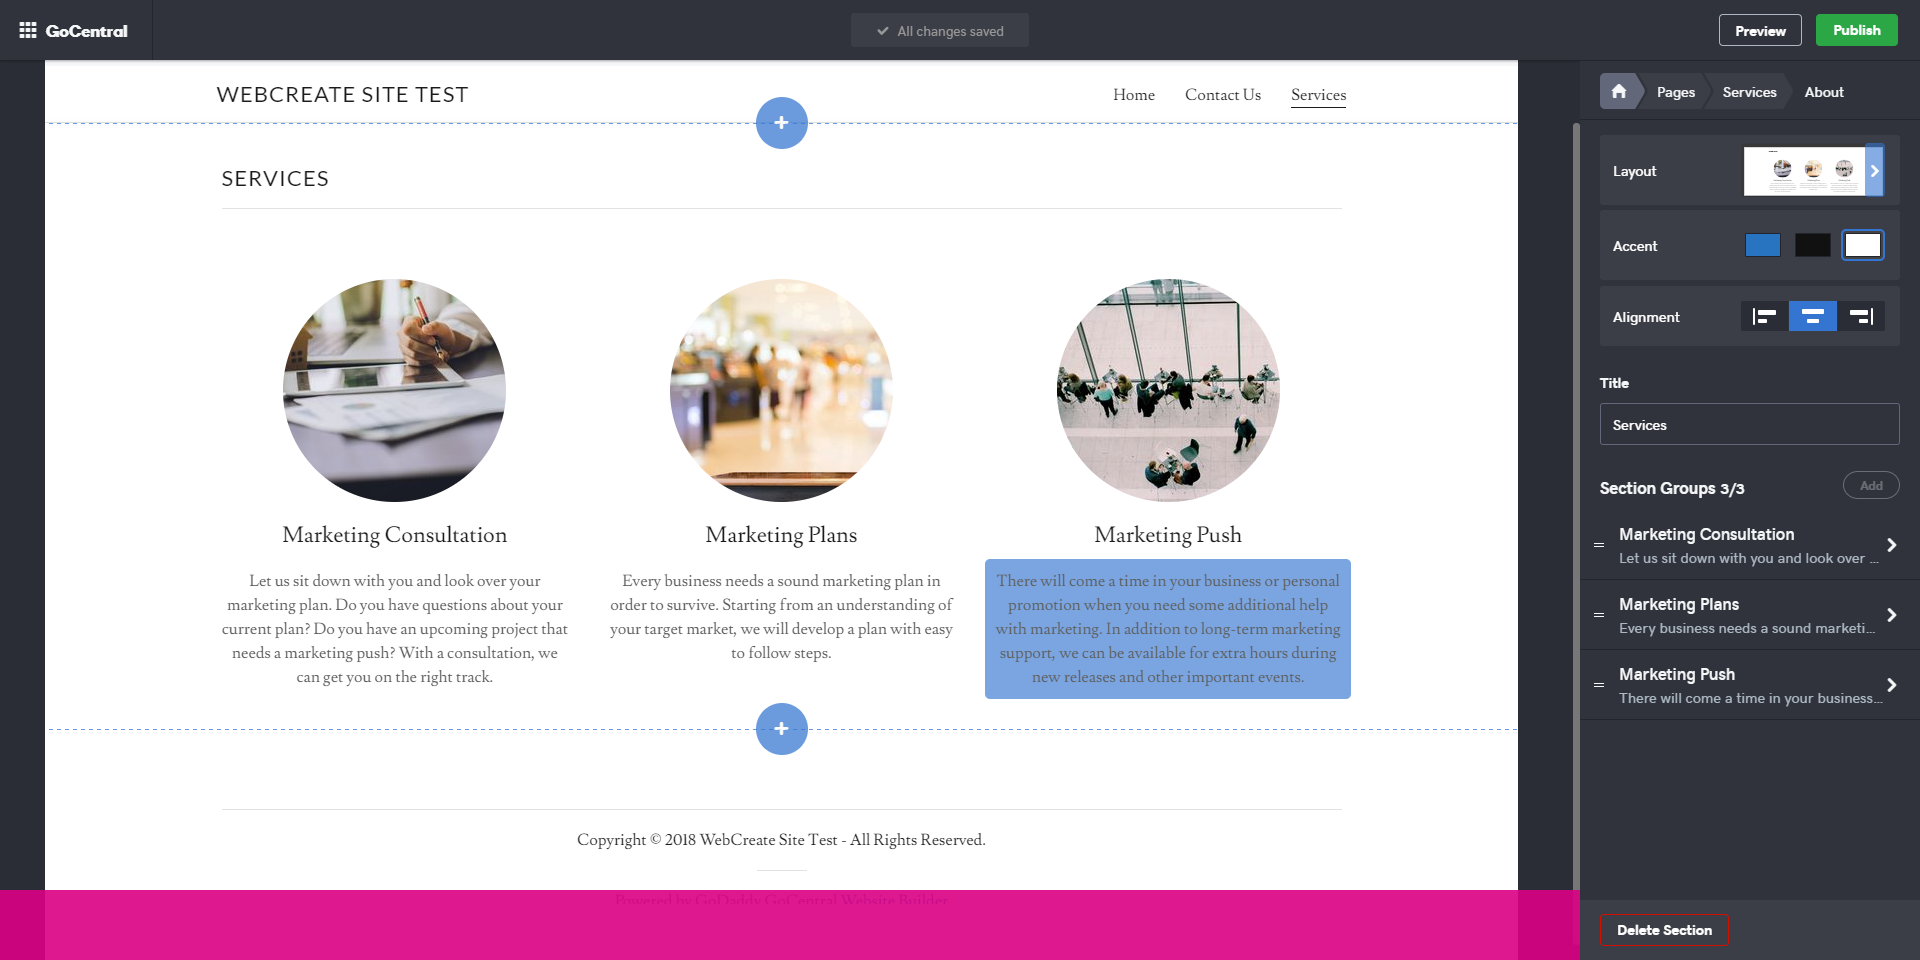 GoDaddy Website Editor